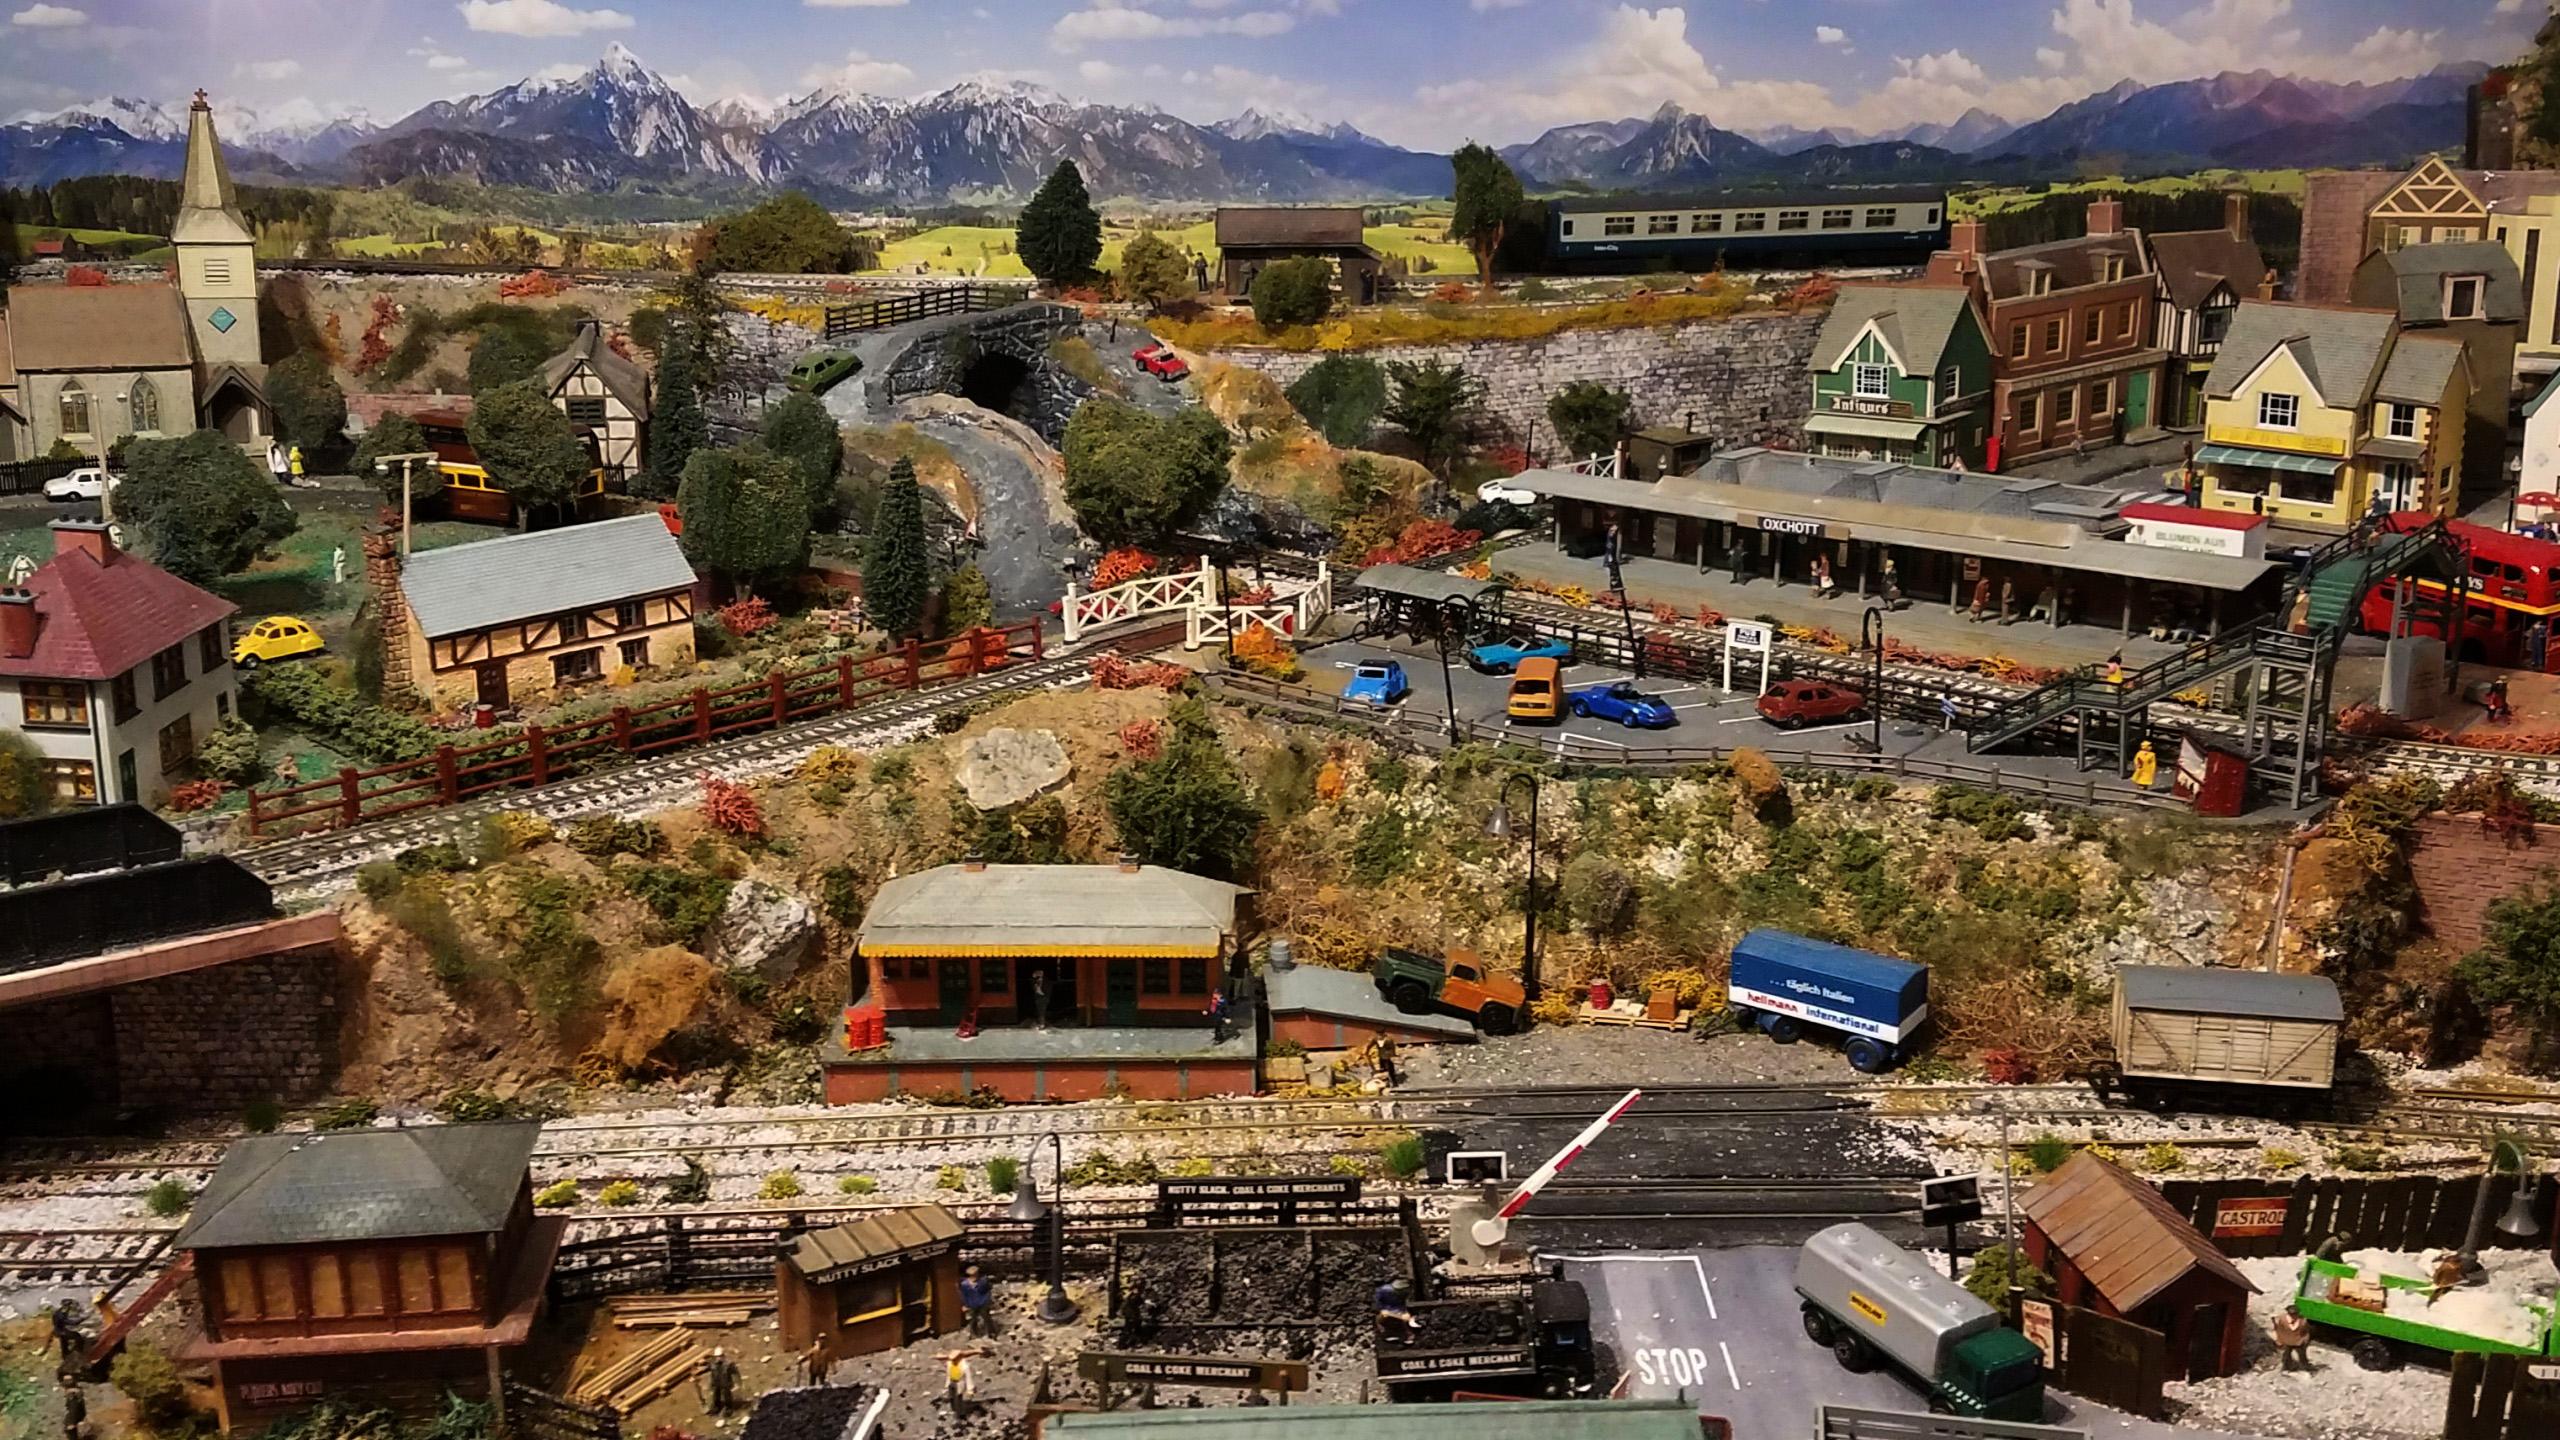 model railway with backdrop